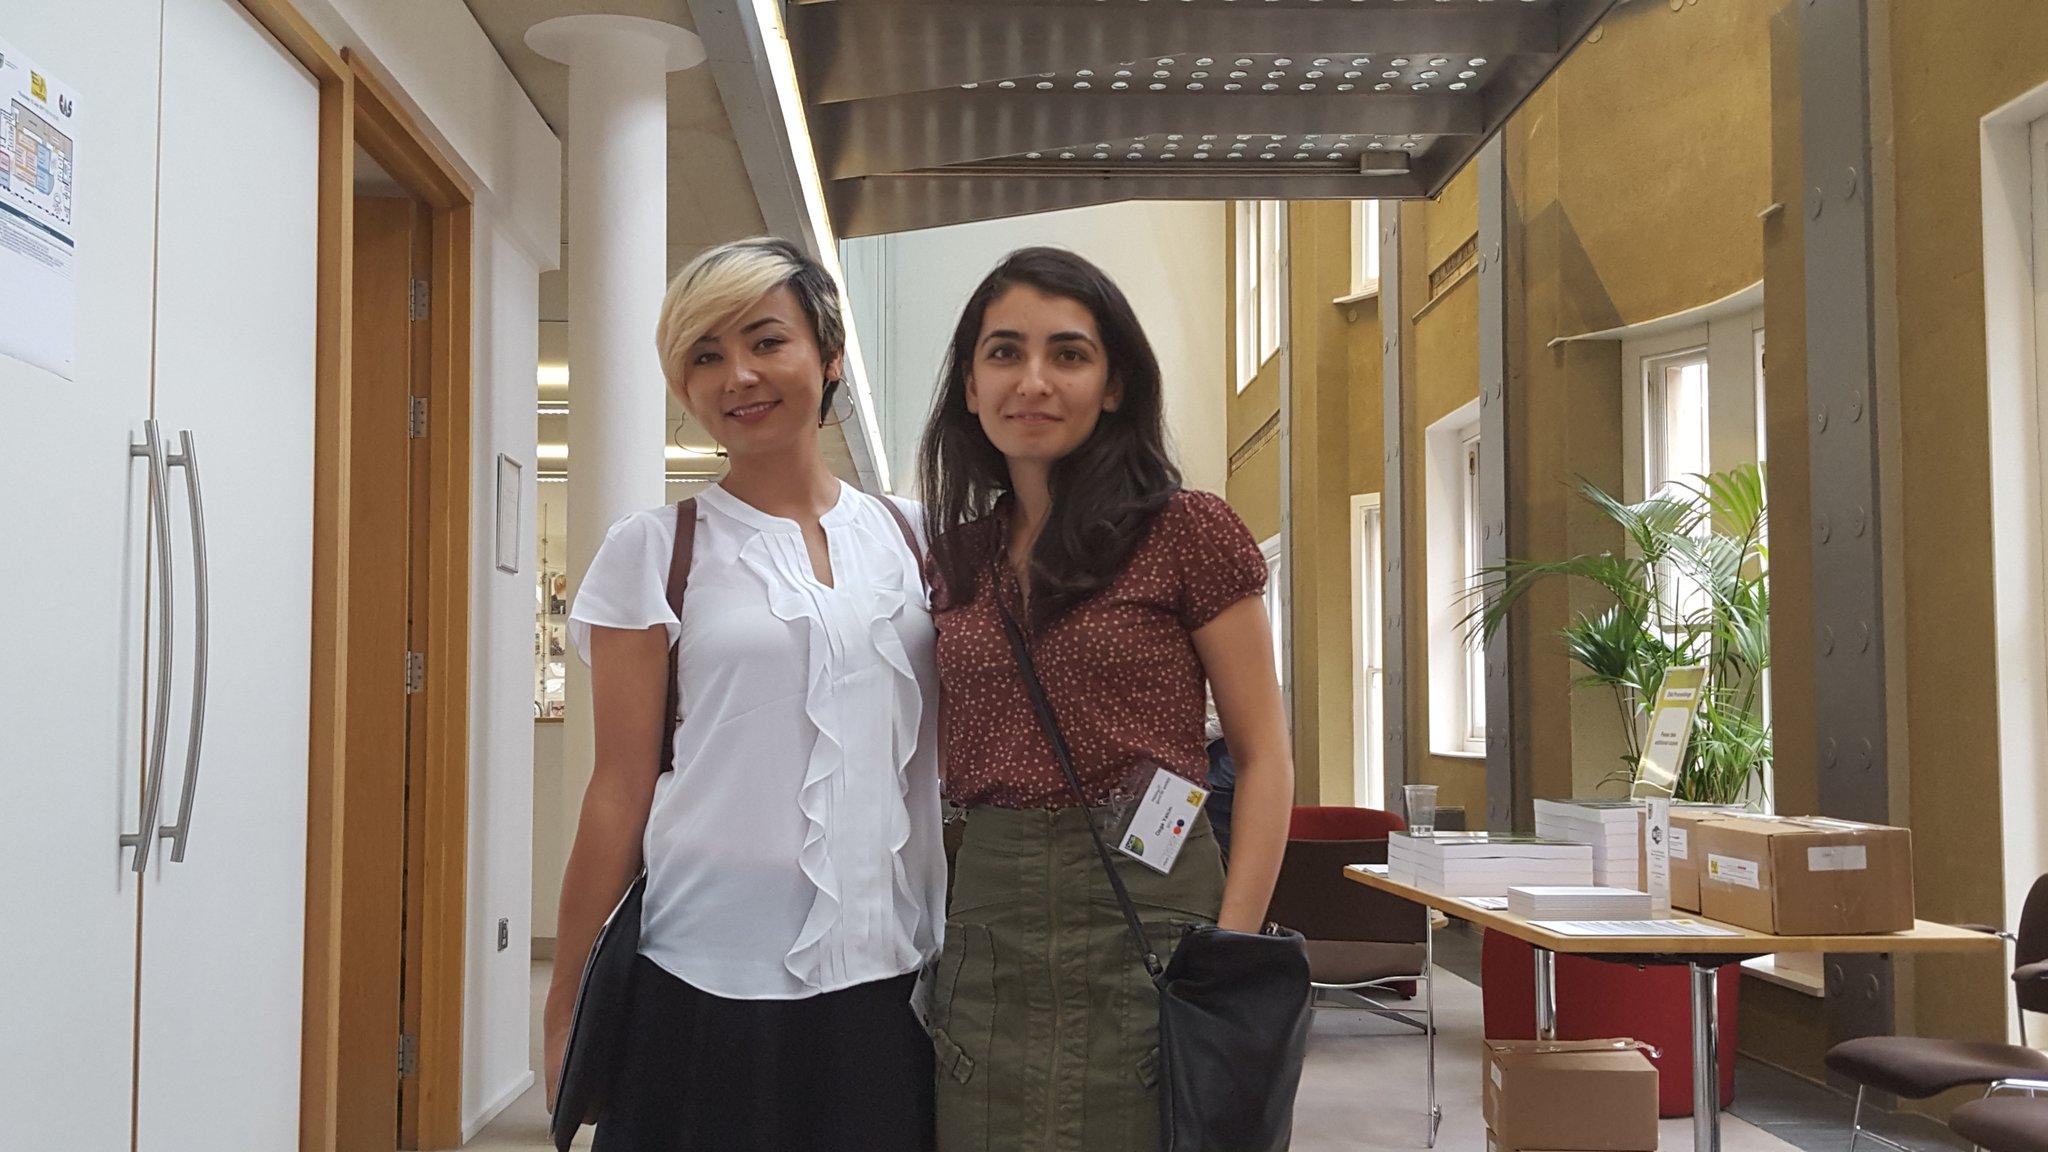 Aynur and Ozge at EVA London. Photo via EVA London